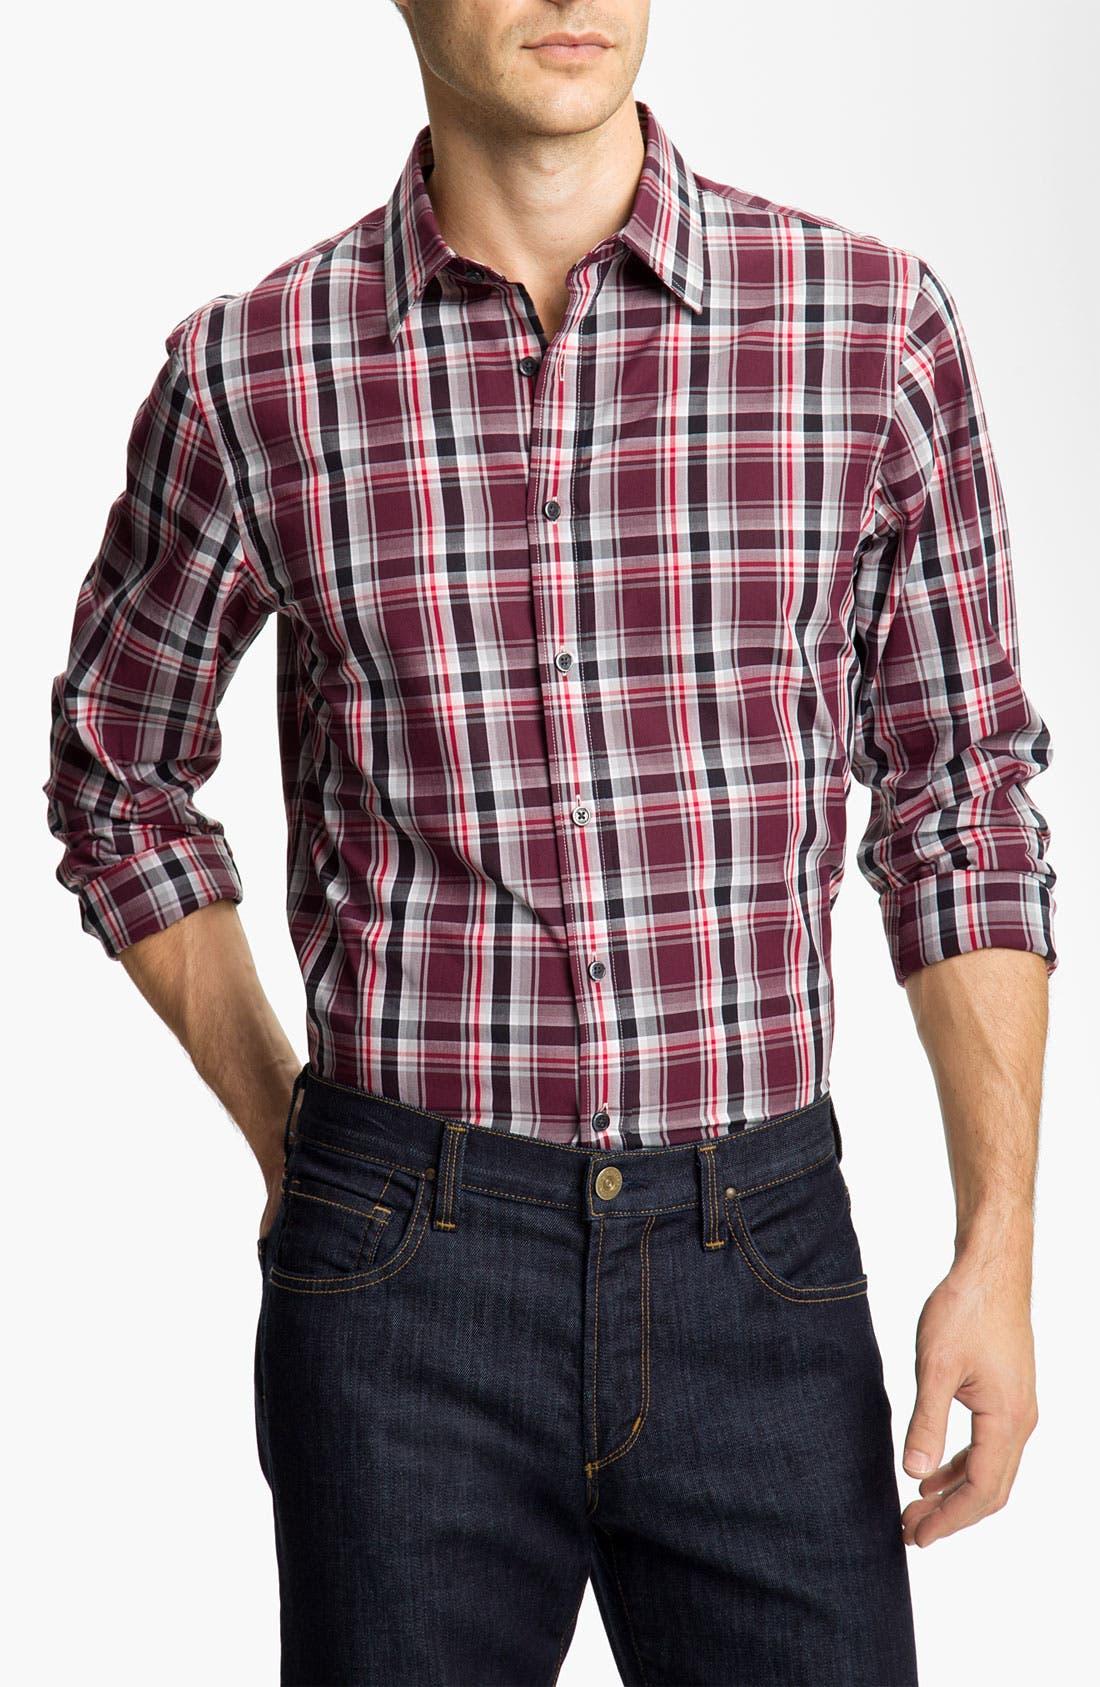 Alternate Image 1 Selected - Michael Kors 'Halden Check' Sport Shirt